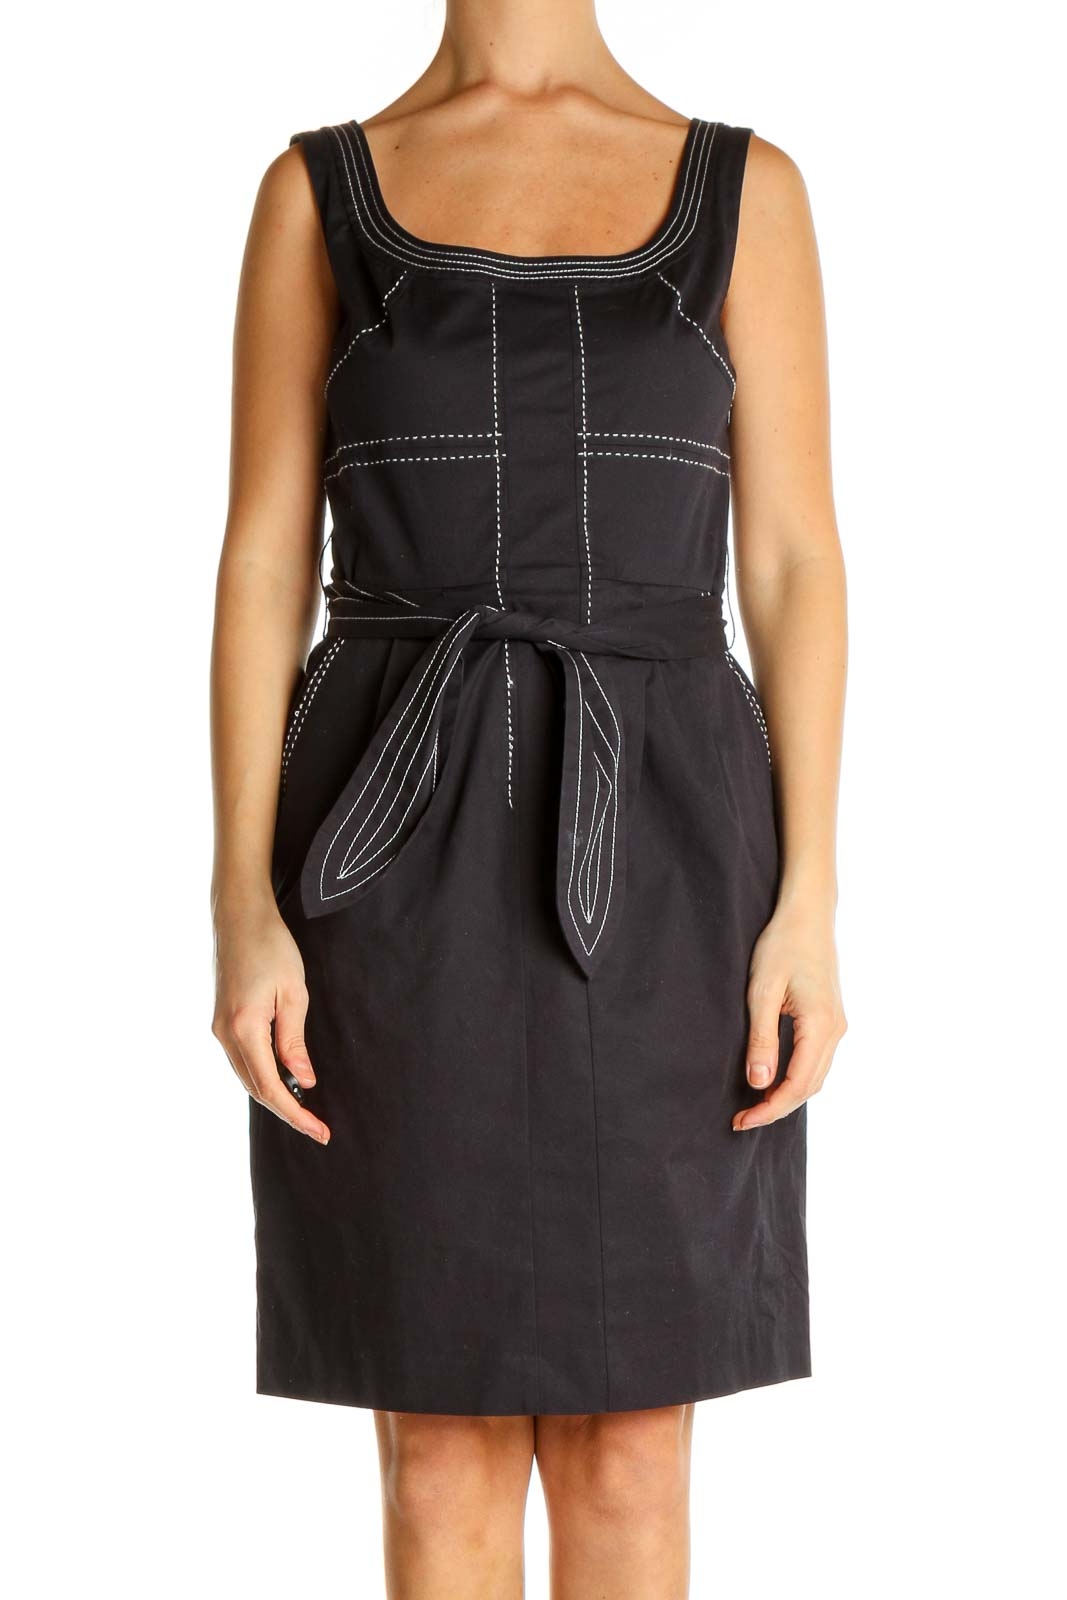 Black Solid Sheath Dress Front